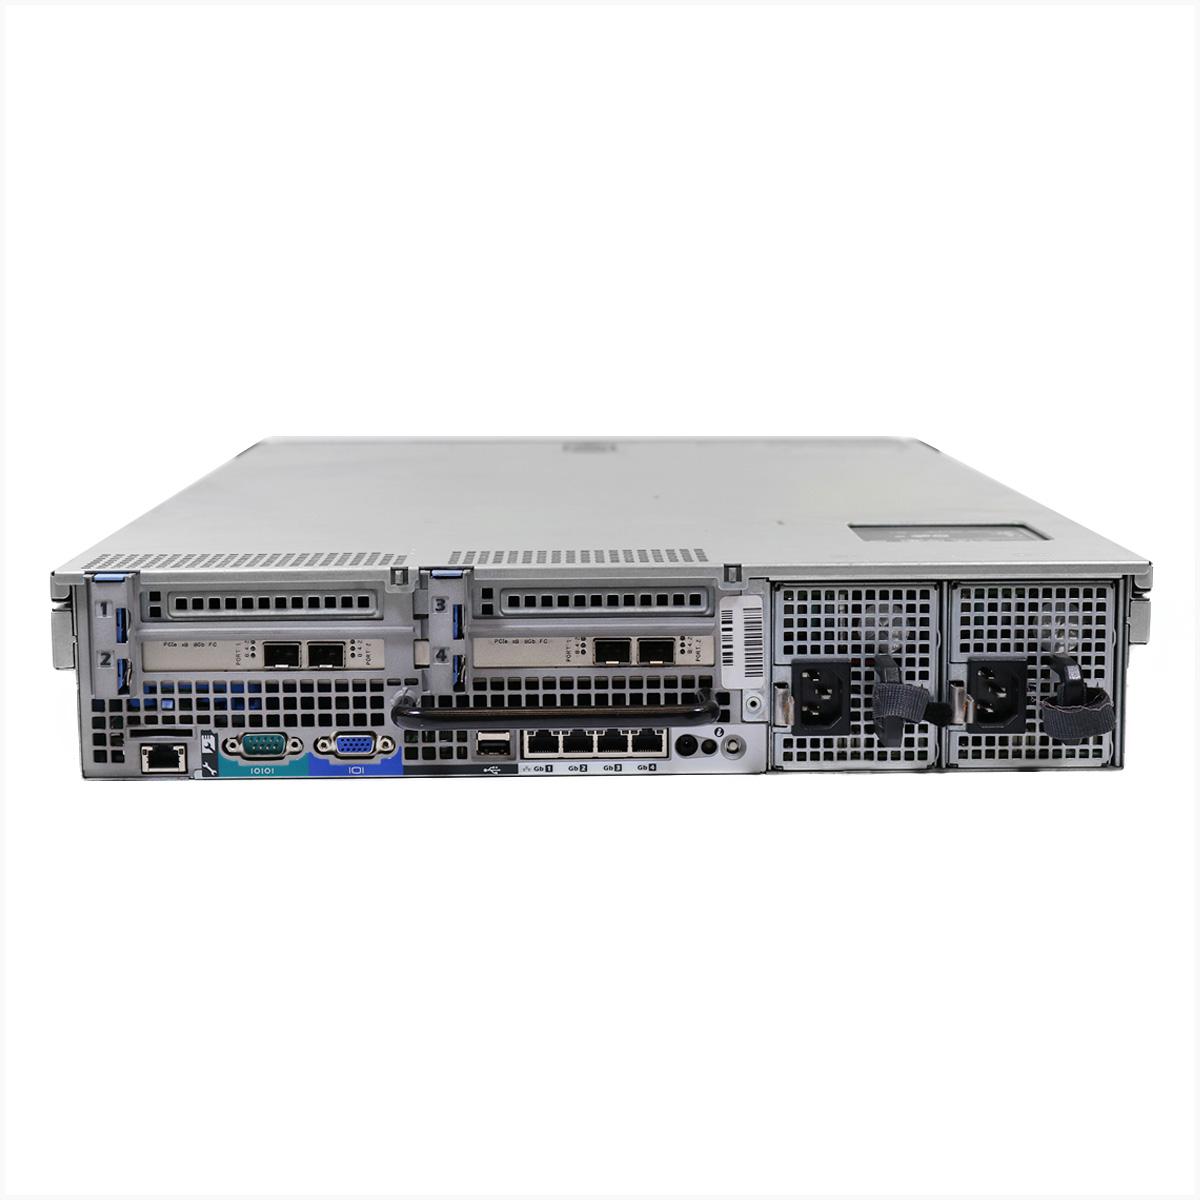 Servidor dell r710 2x xeon x5620 64gb 2x 1tb - usado